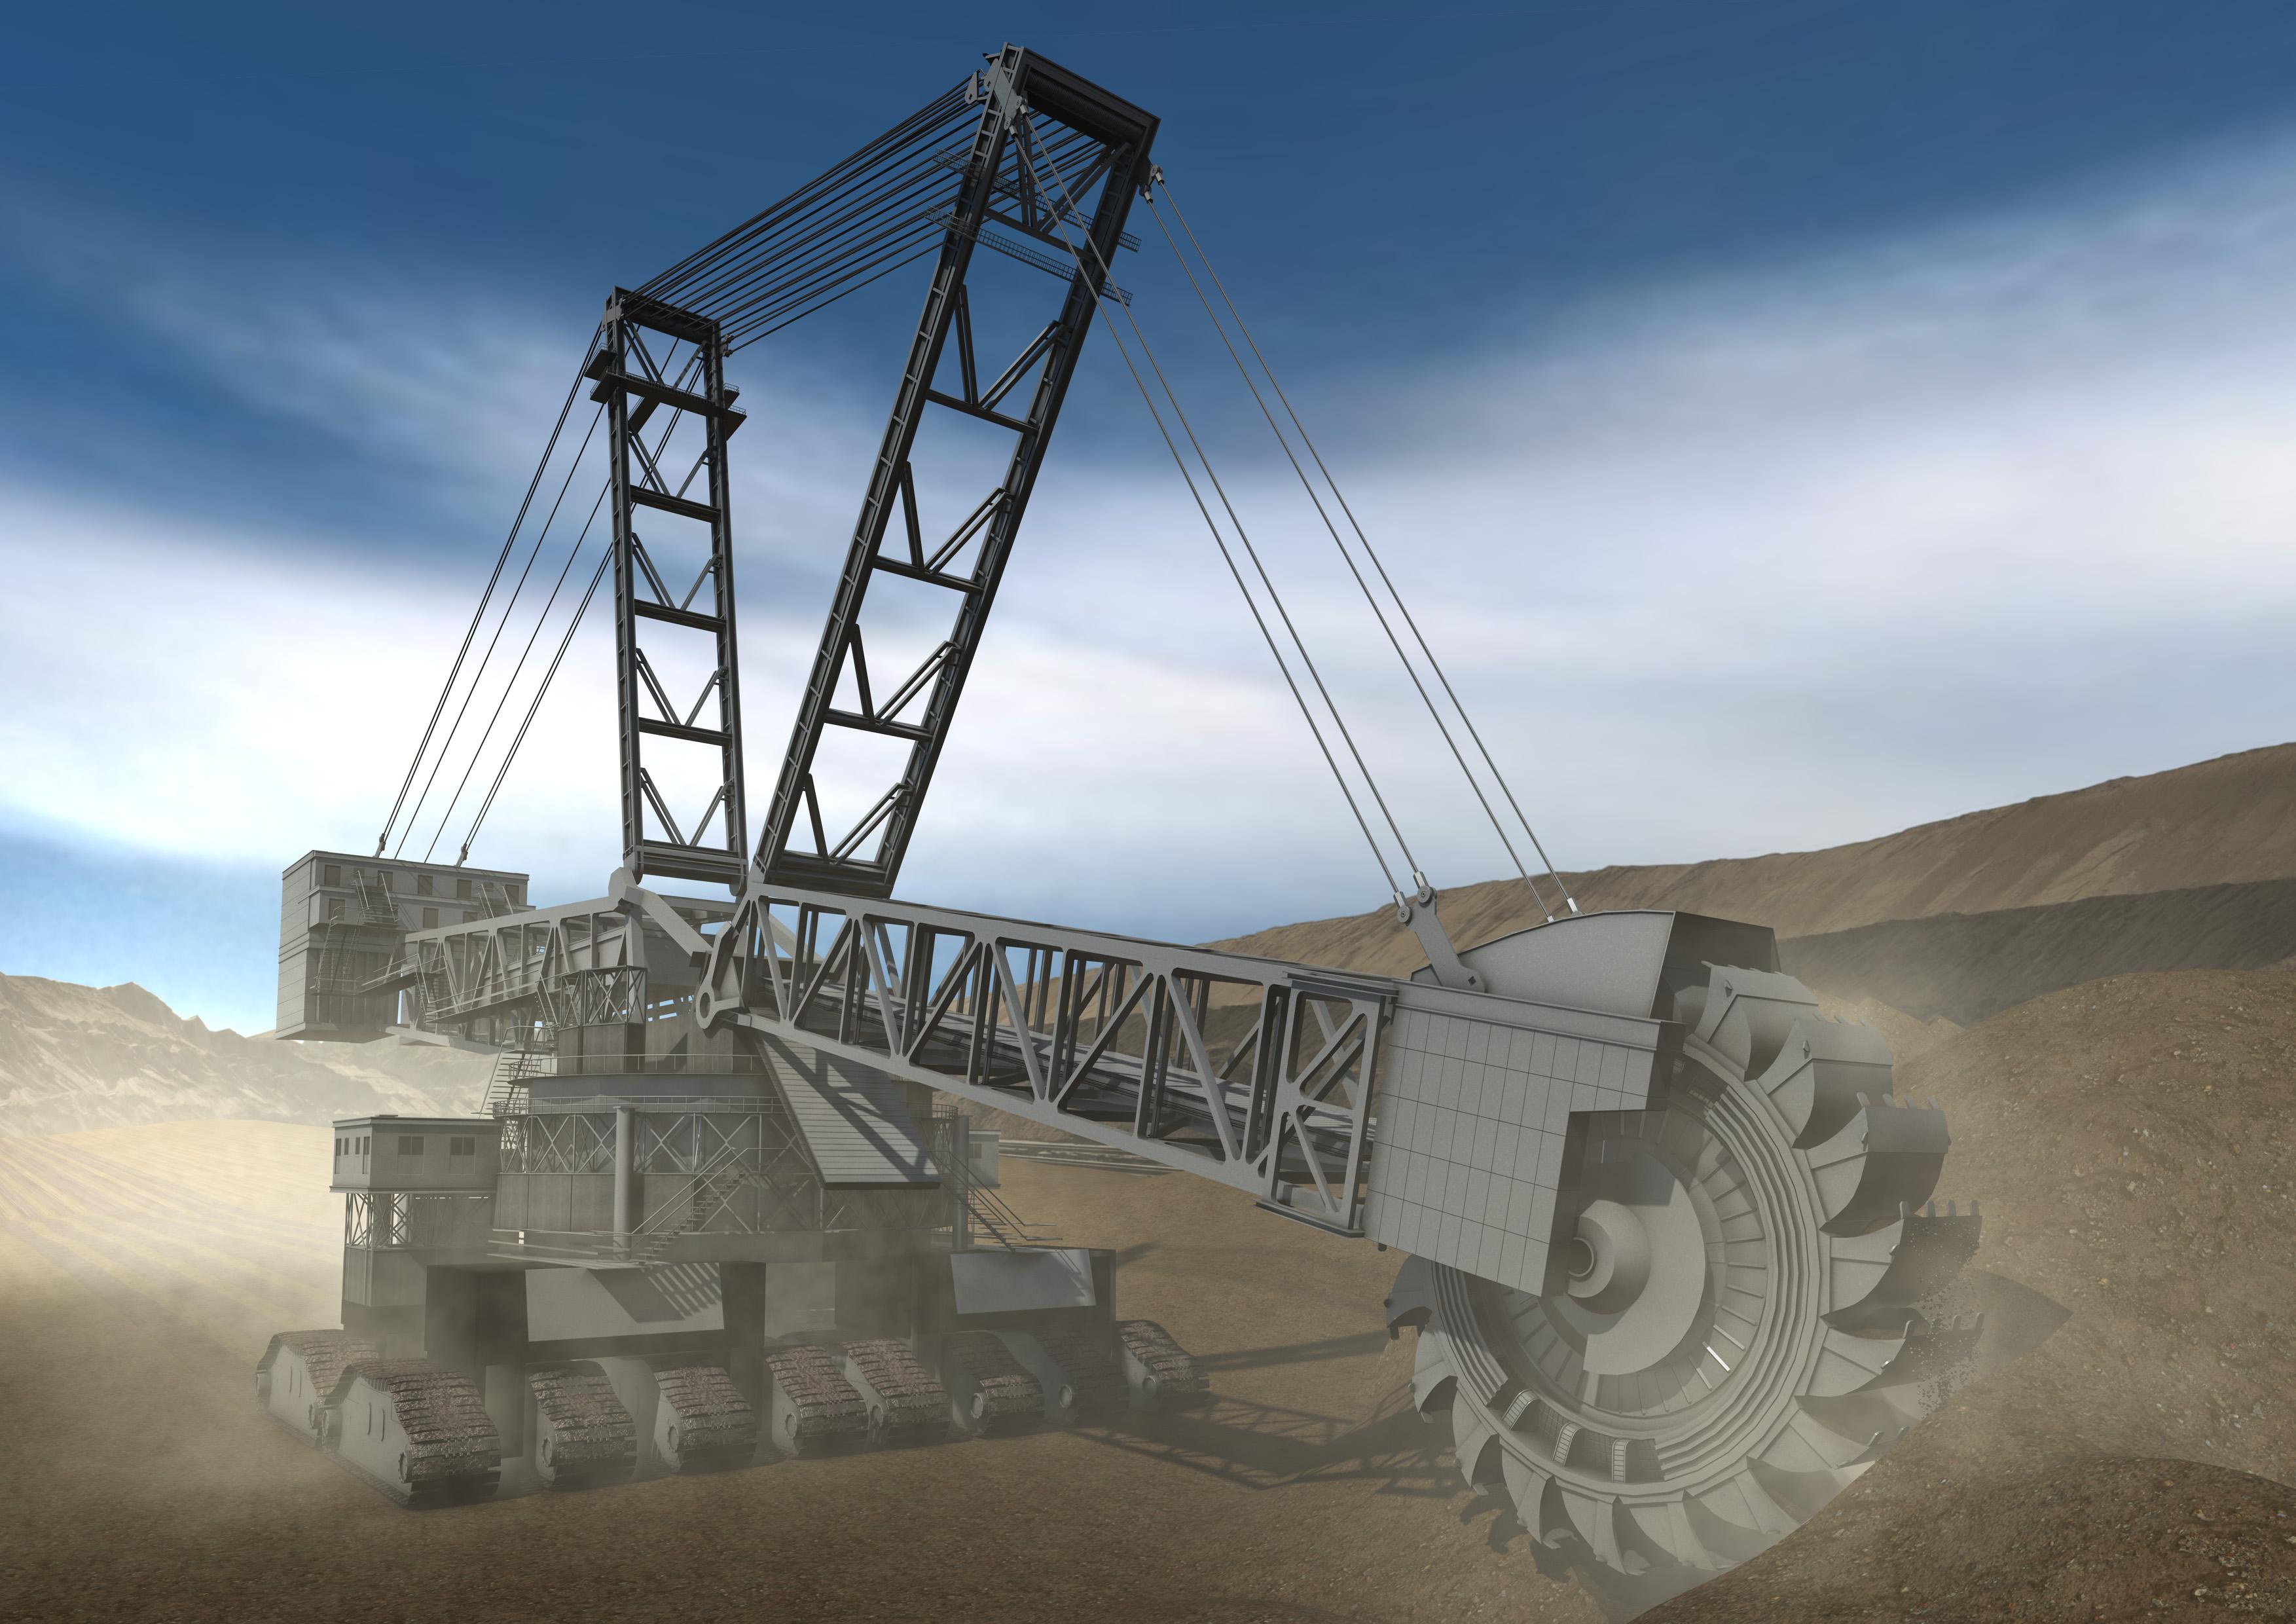 A-0296-0-DCH-DiggingMachine